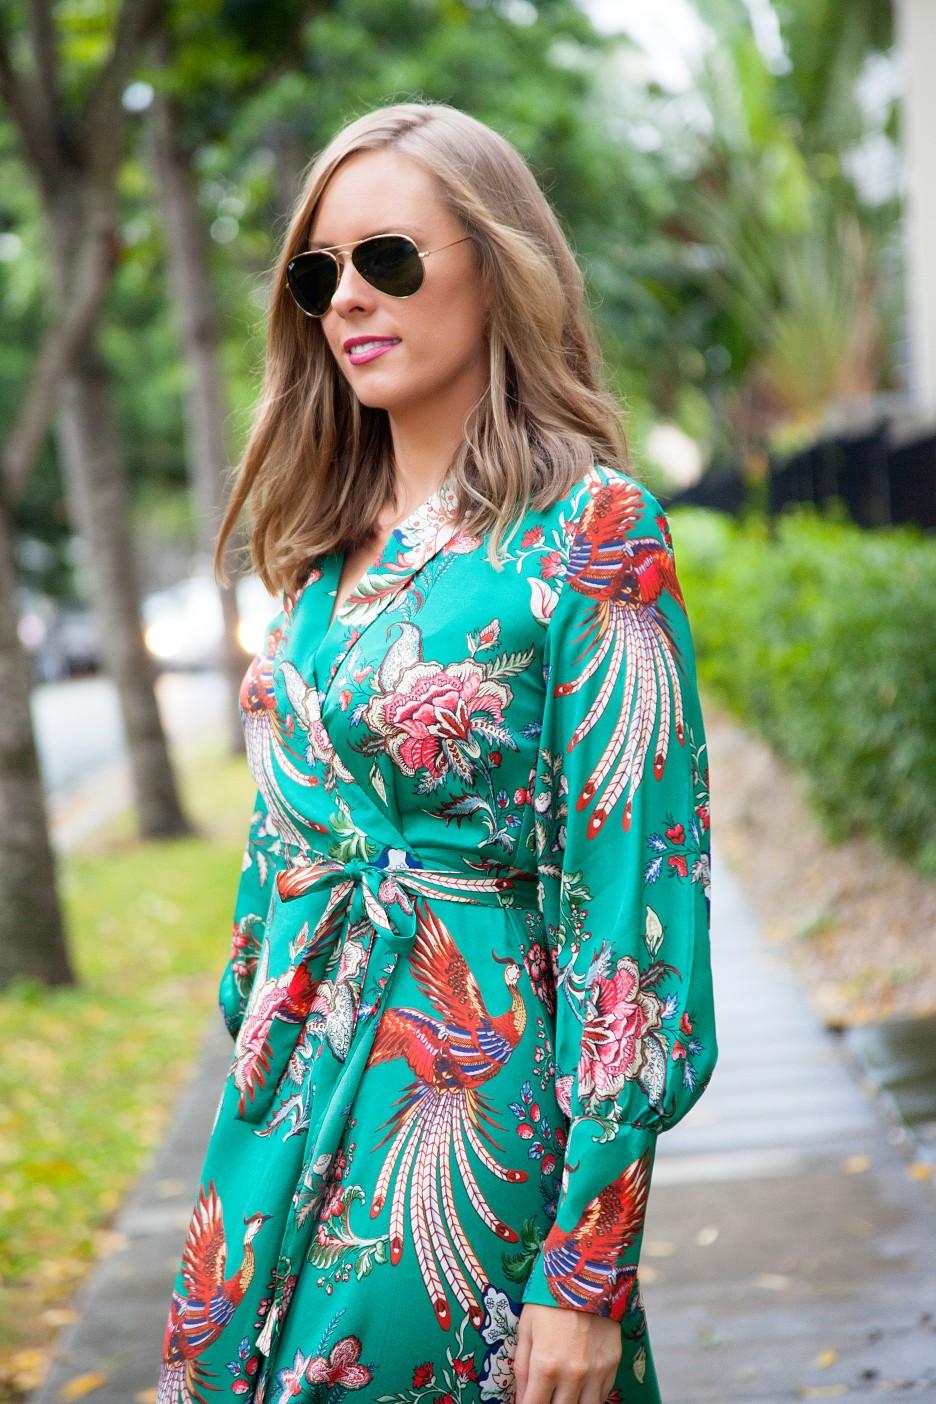 silk pajama print green emerald dress fashion blogger outfit ideas chanel flap handbag lauren slade style elixir 6